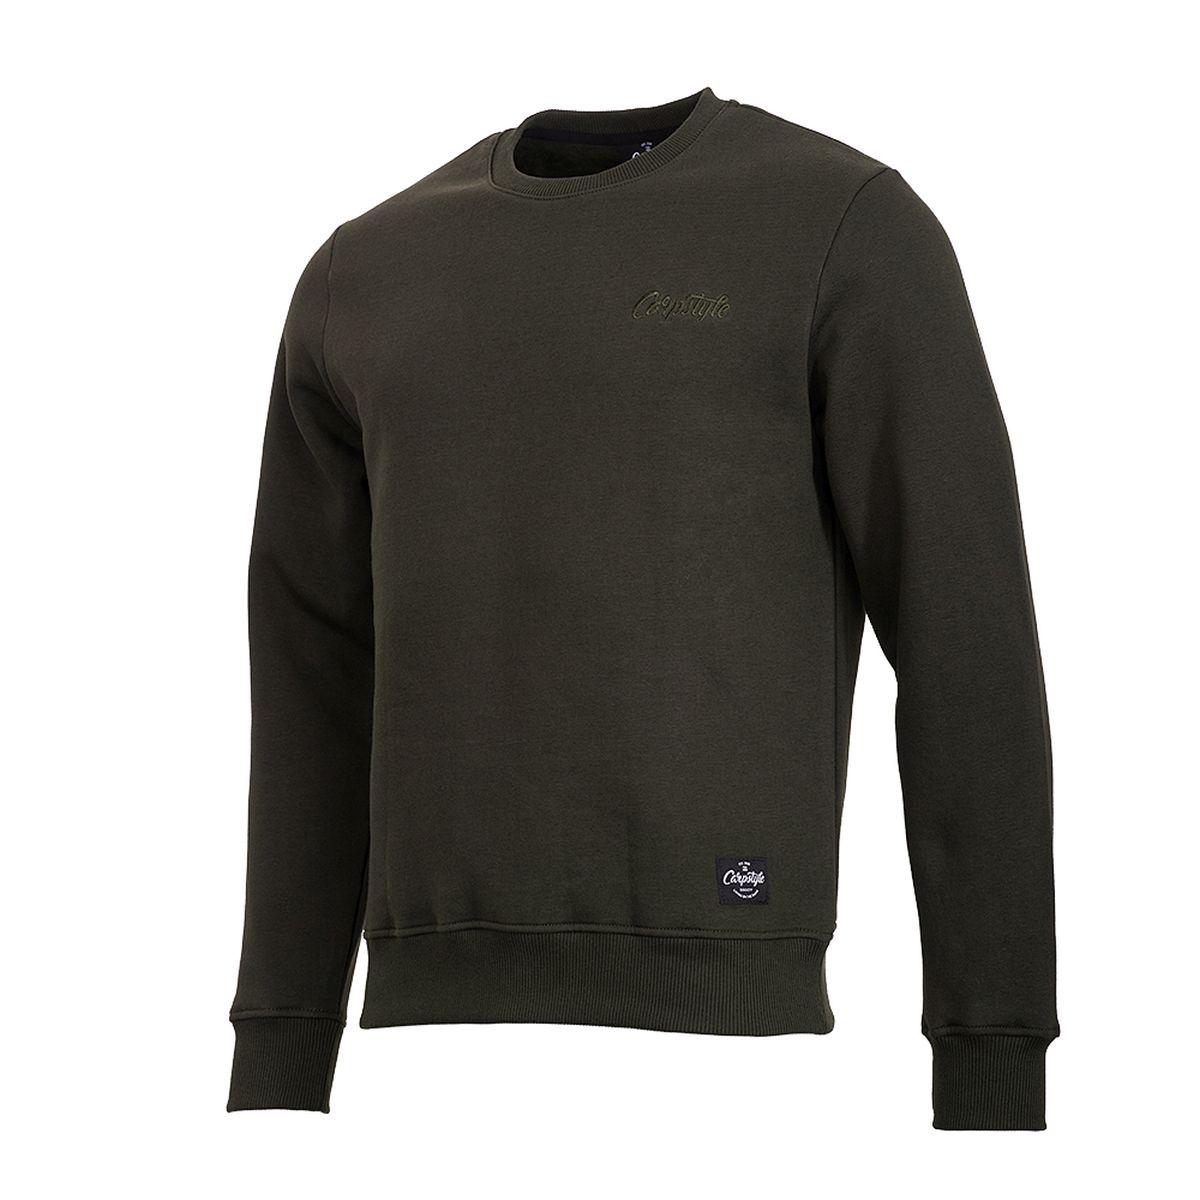 CARPSTYLE Bank Sweatshirt - L